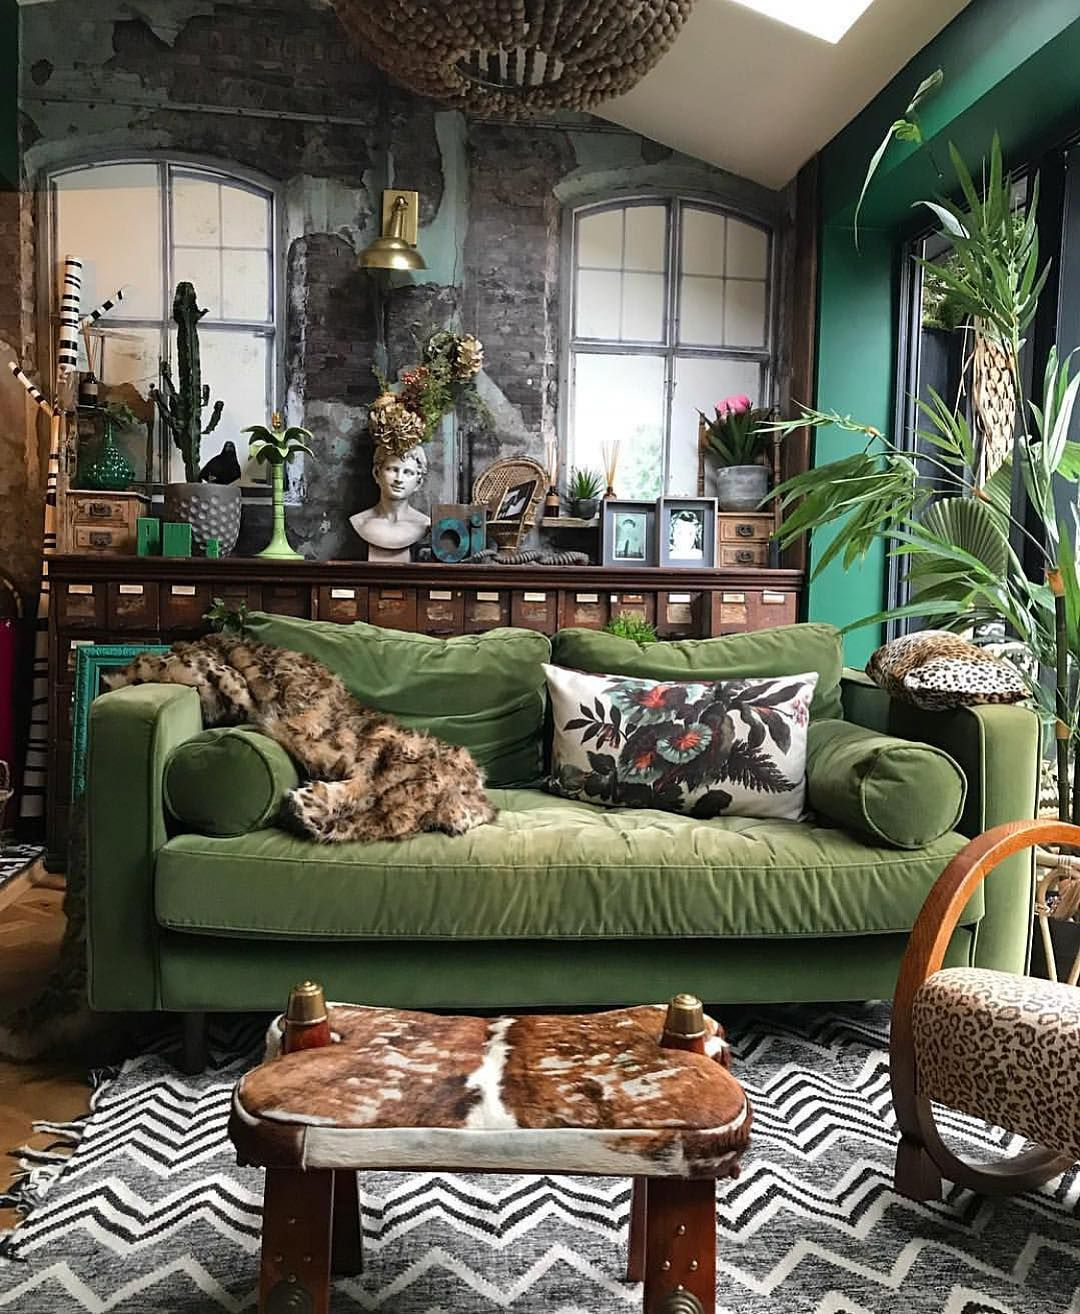 Jan Skacelik On Instagram Happy Monday Recently The Green